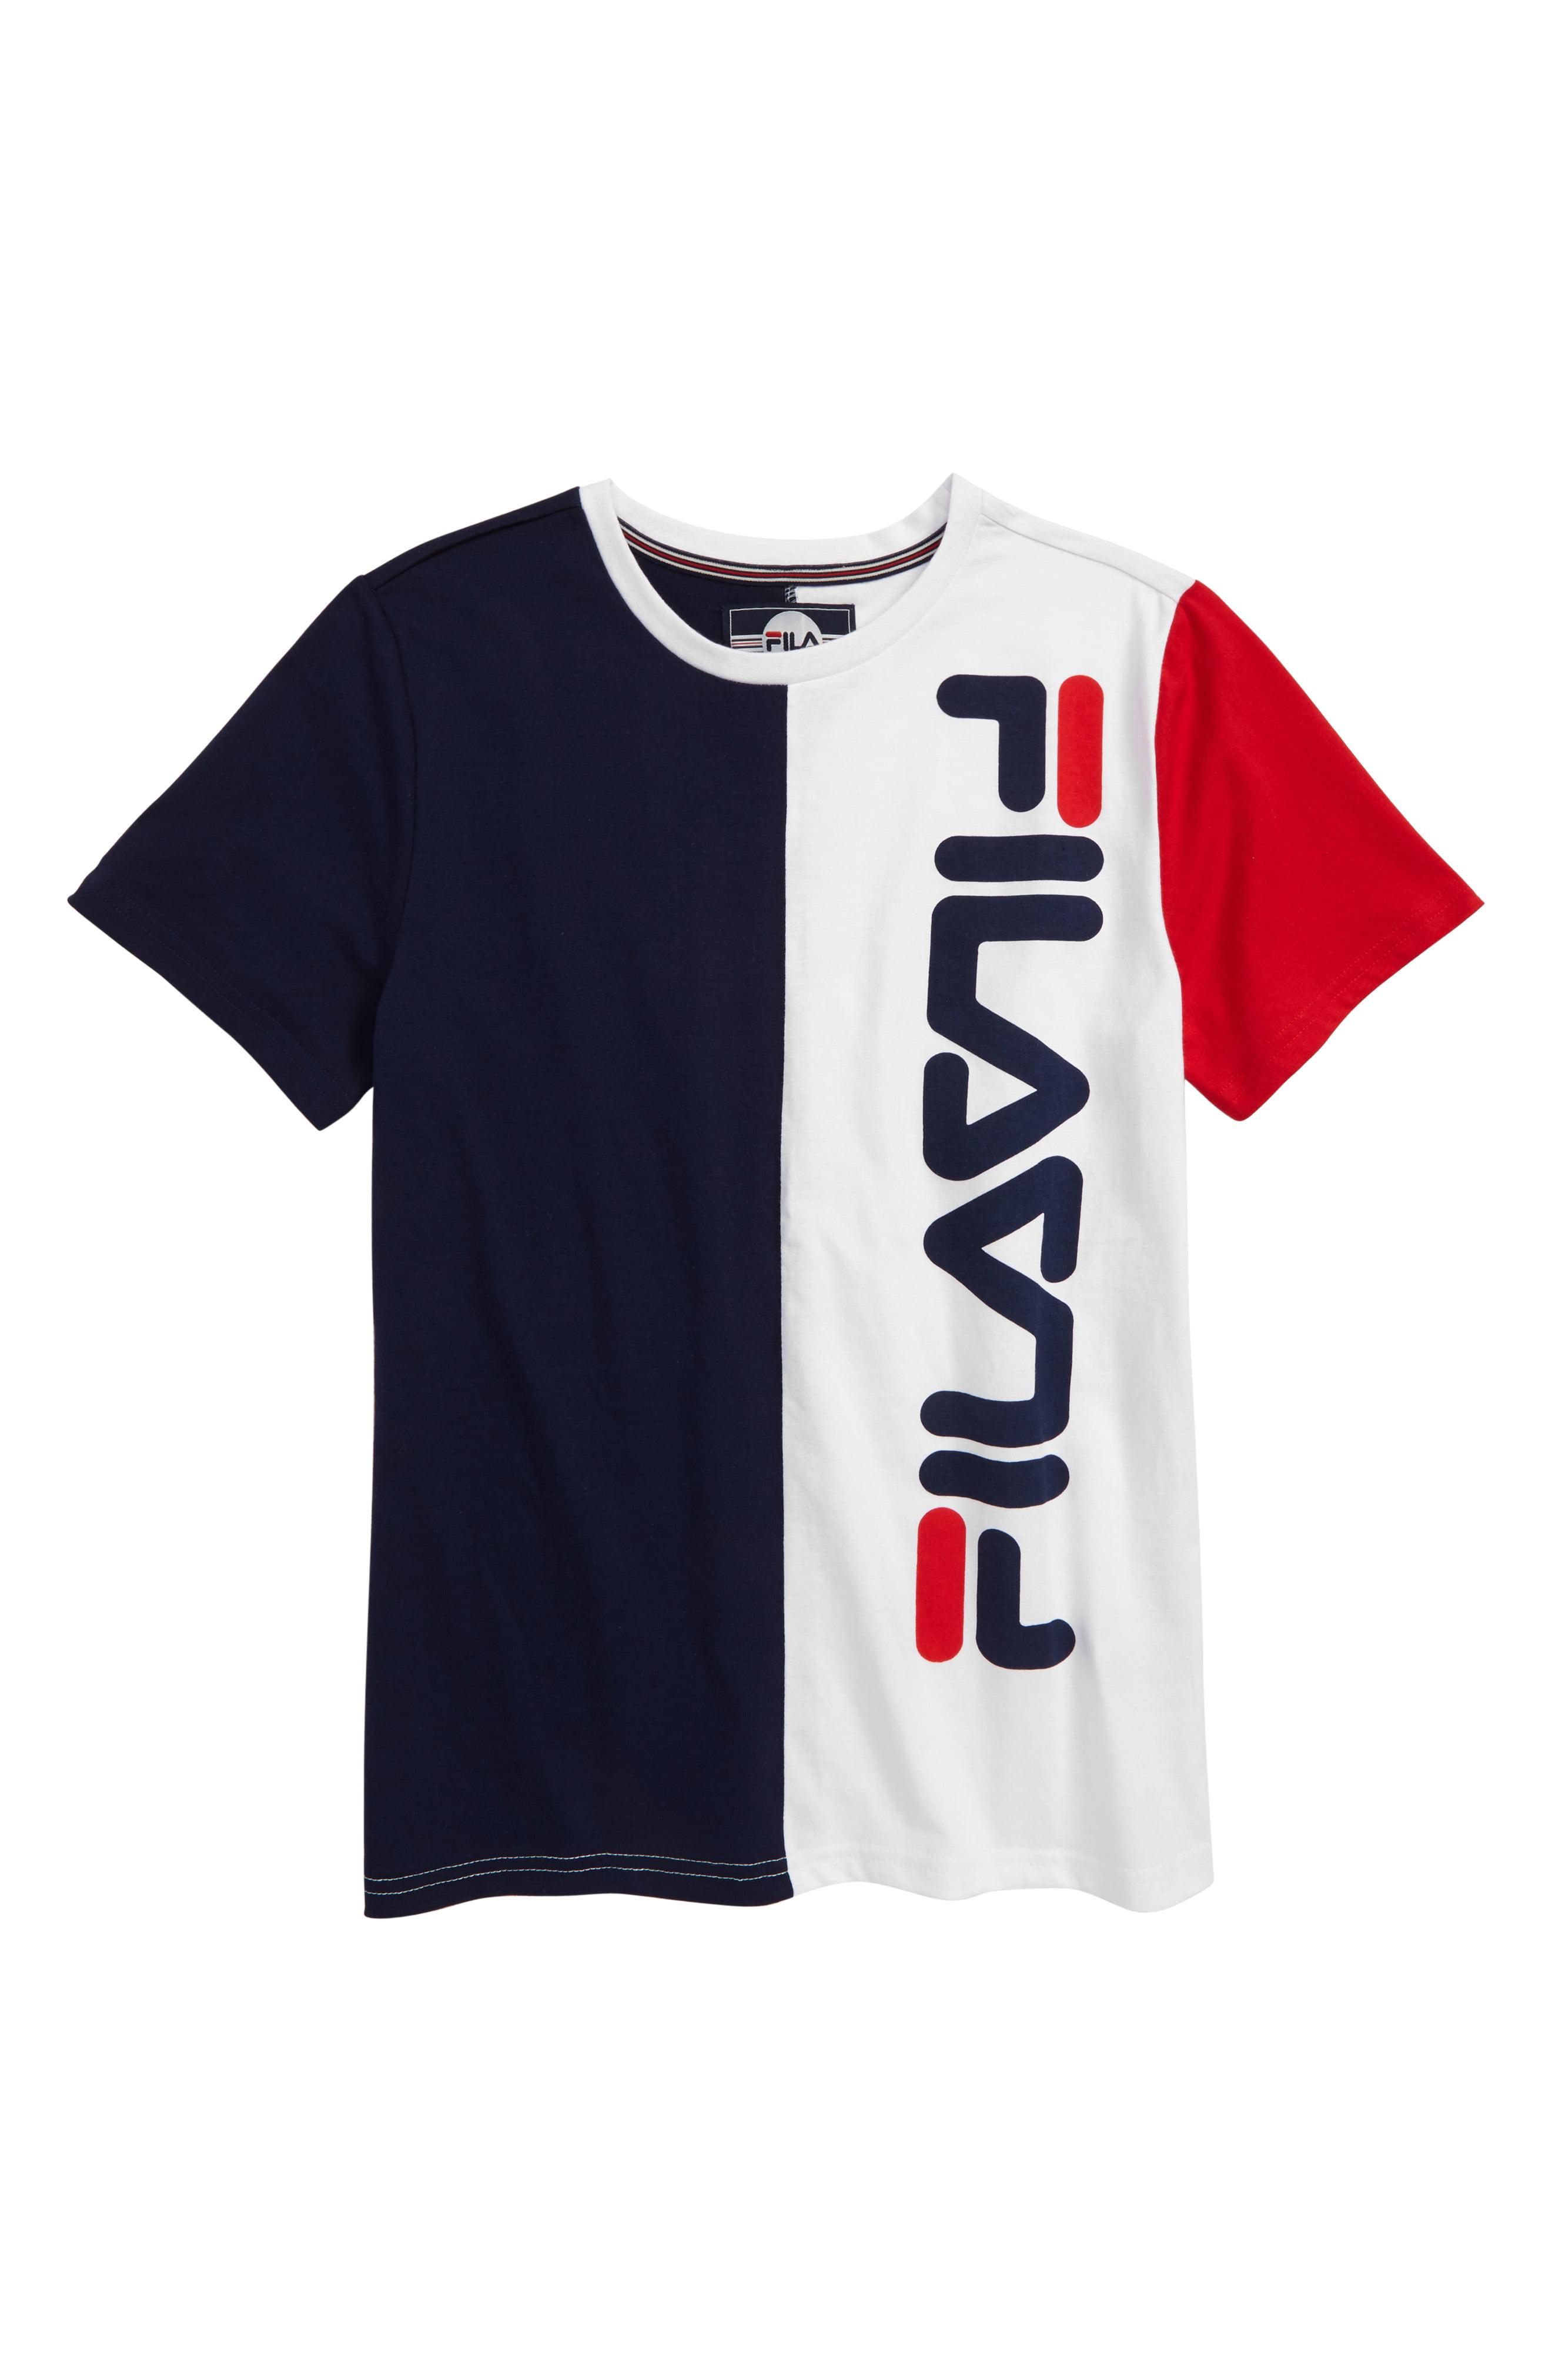 fila colorblock shirt